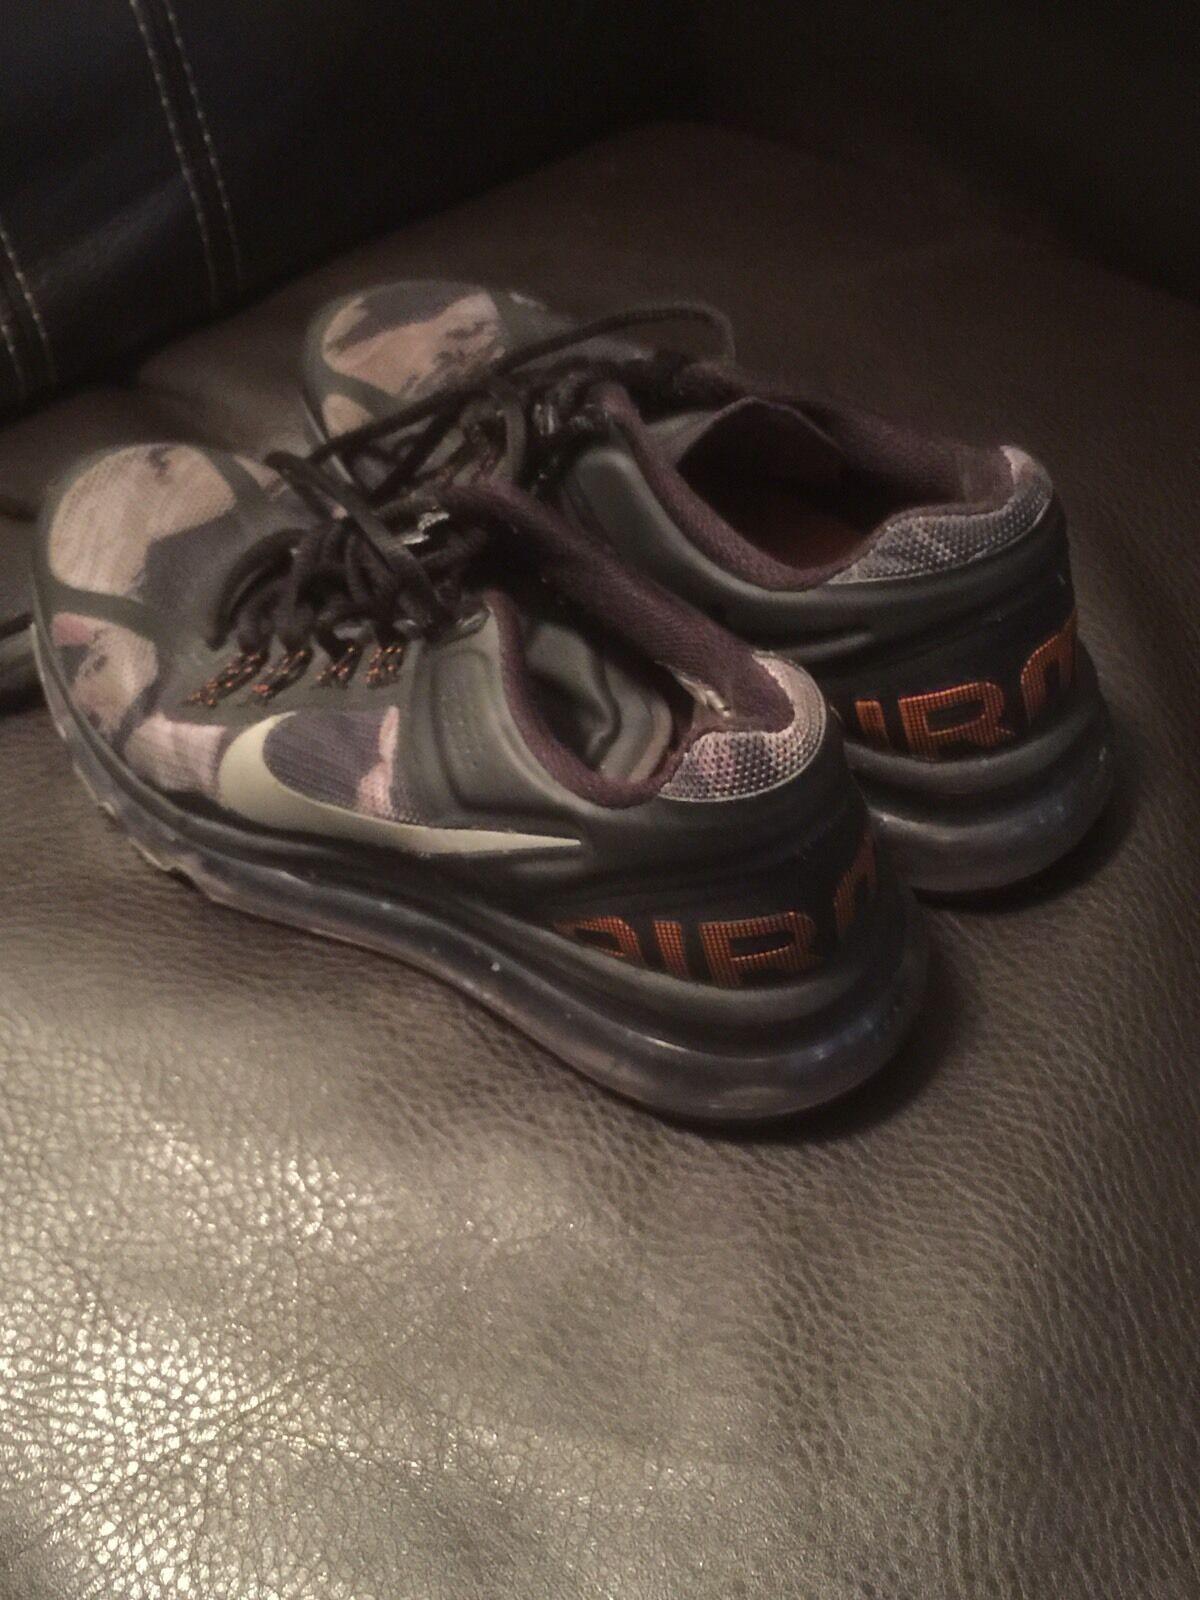 Nike Kids Air Max 2013 Gs Μαύρο / Κρύο Γκρι / Ξ£Ο…Ξ½ΞΏΞ»ΞΉΞΊΟŒ Πορτοκαλί (555426 002) SZ 3.5